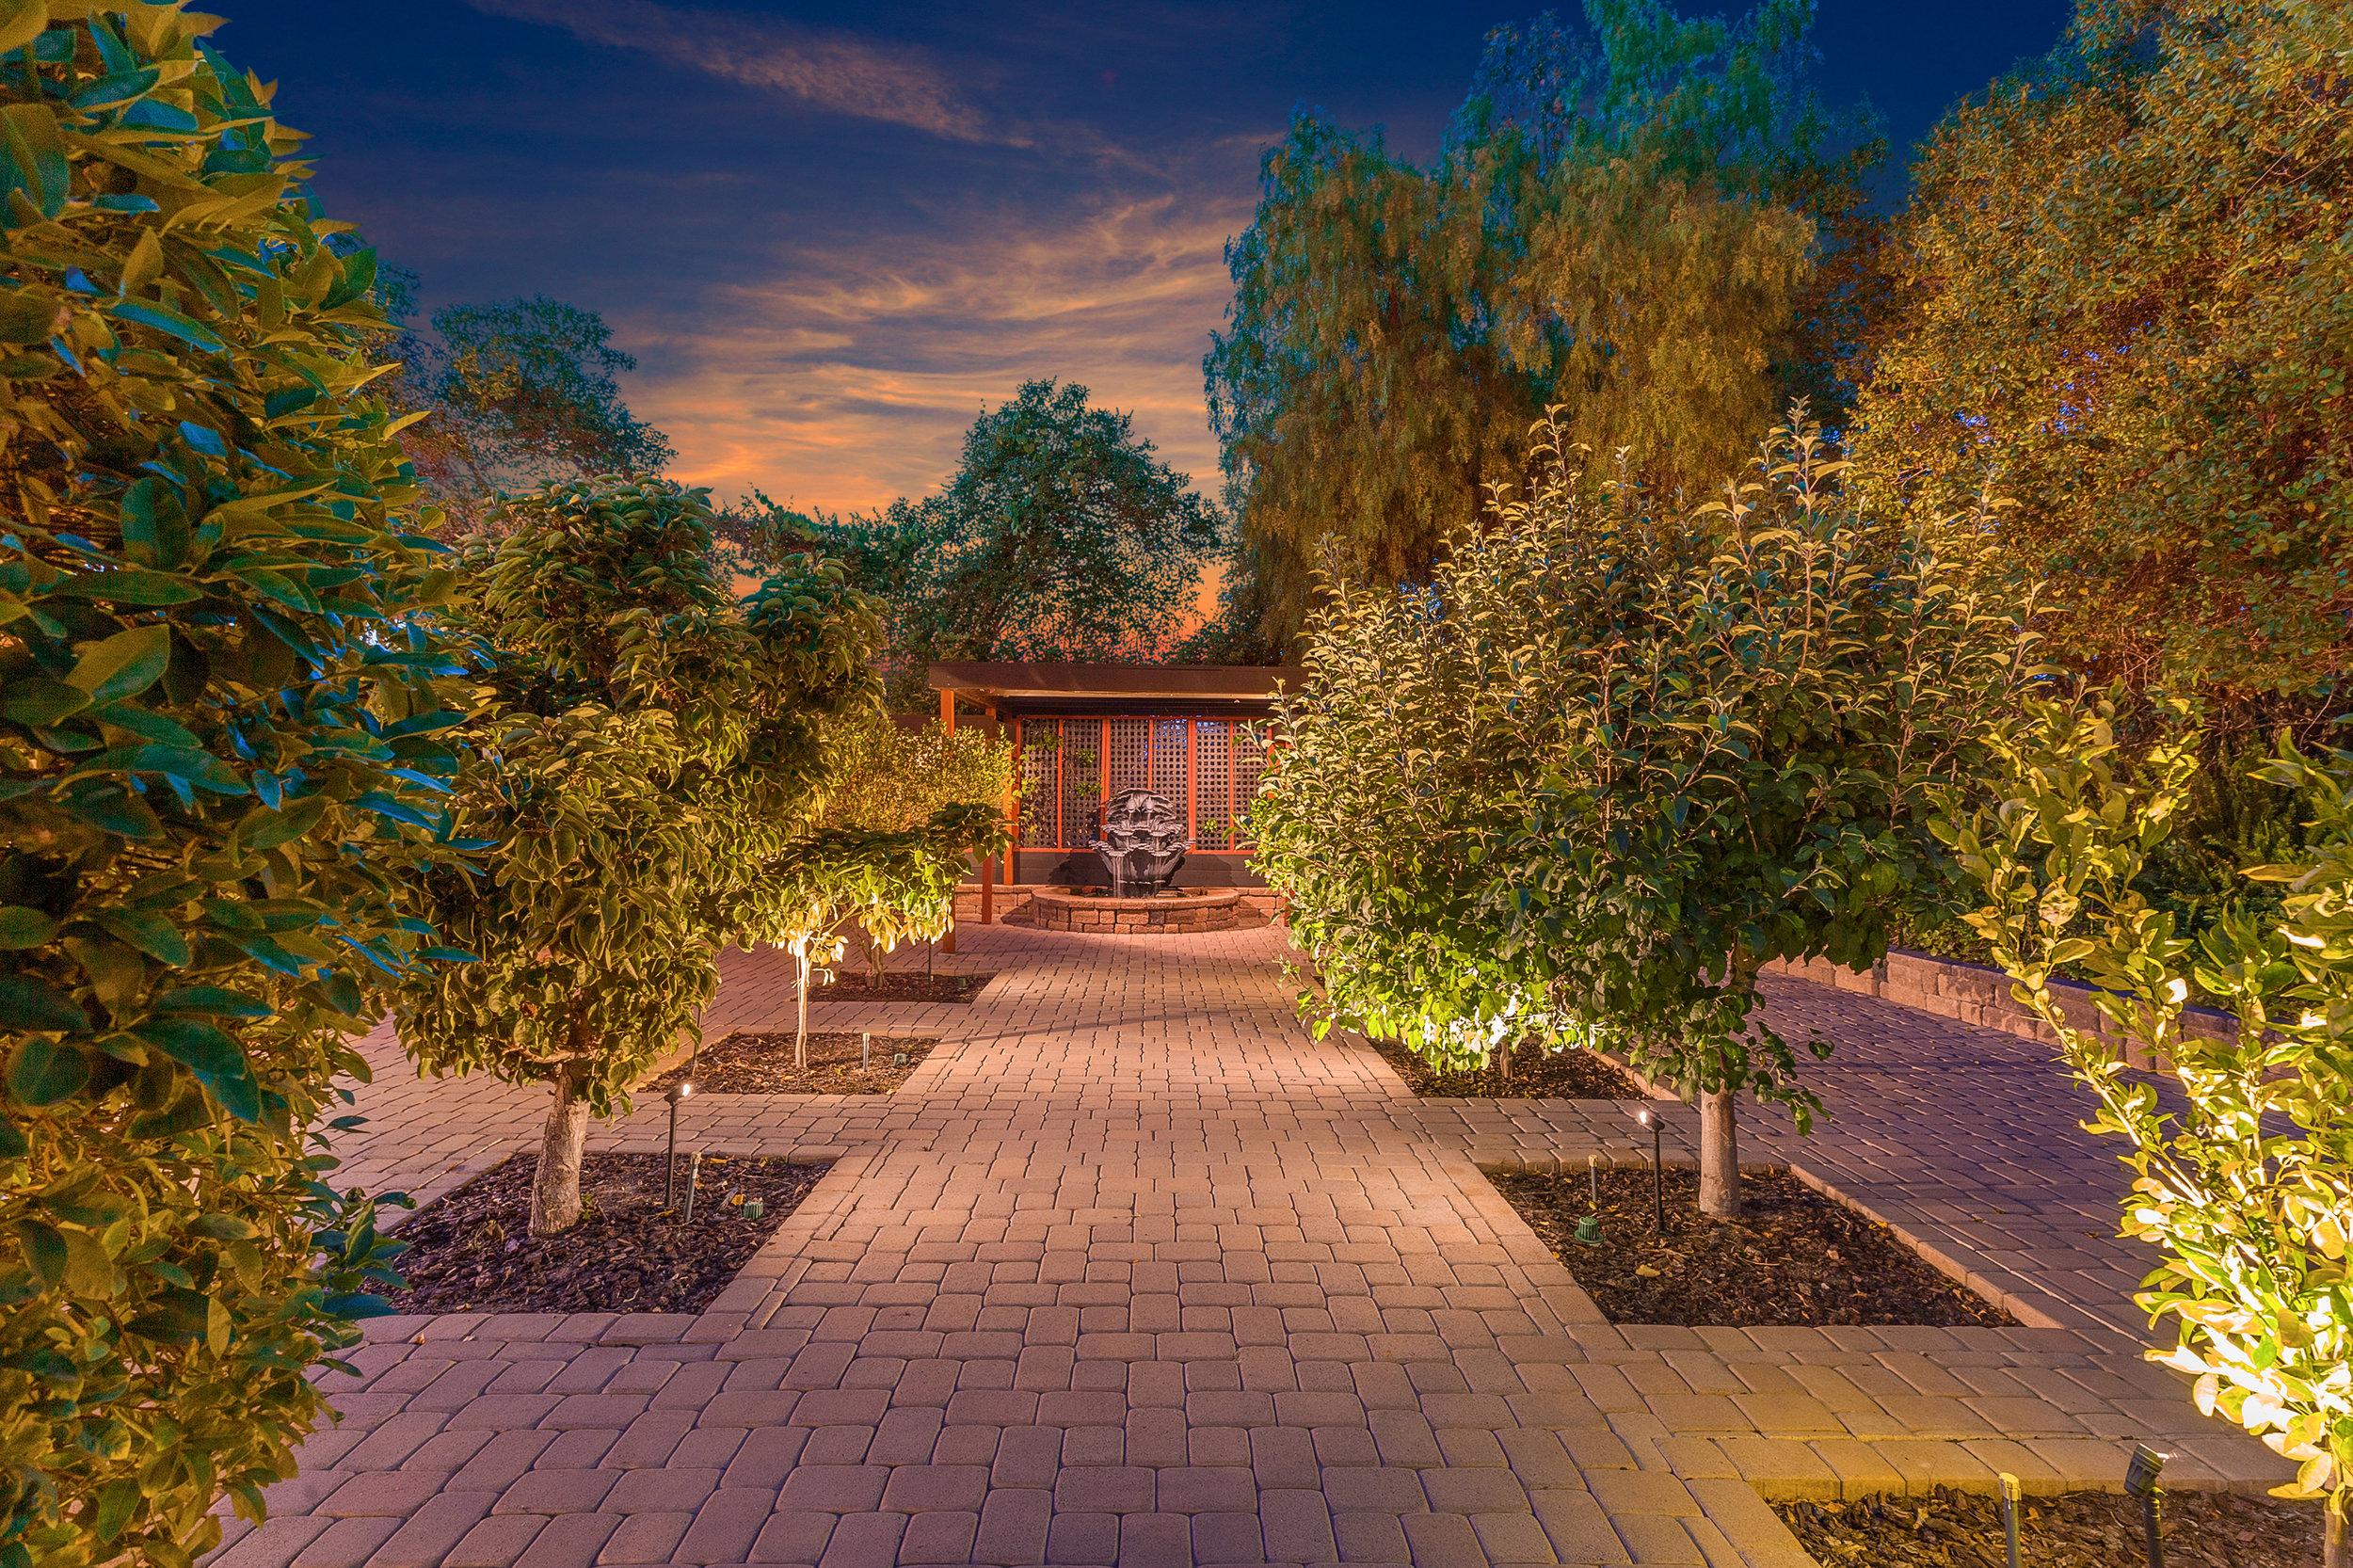 069_Twilight Backyard.jpg